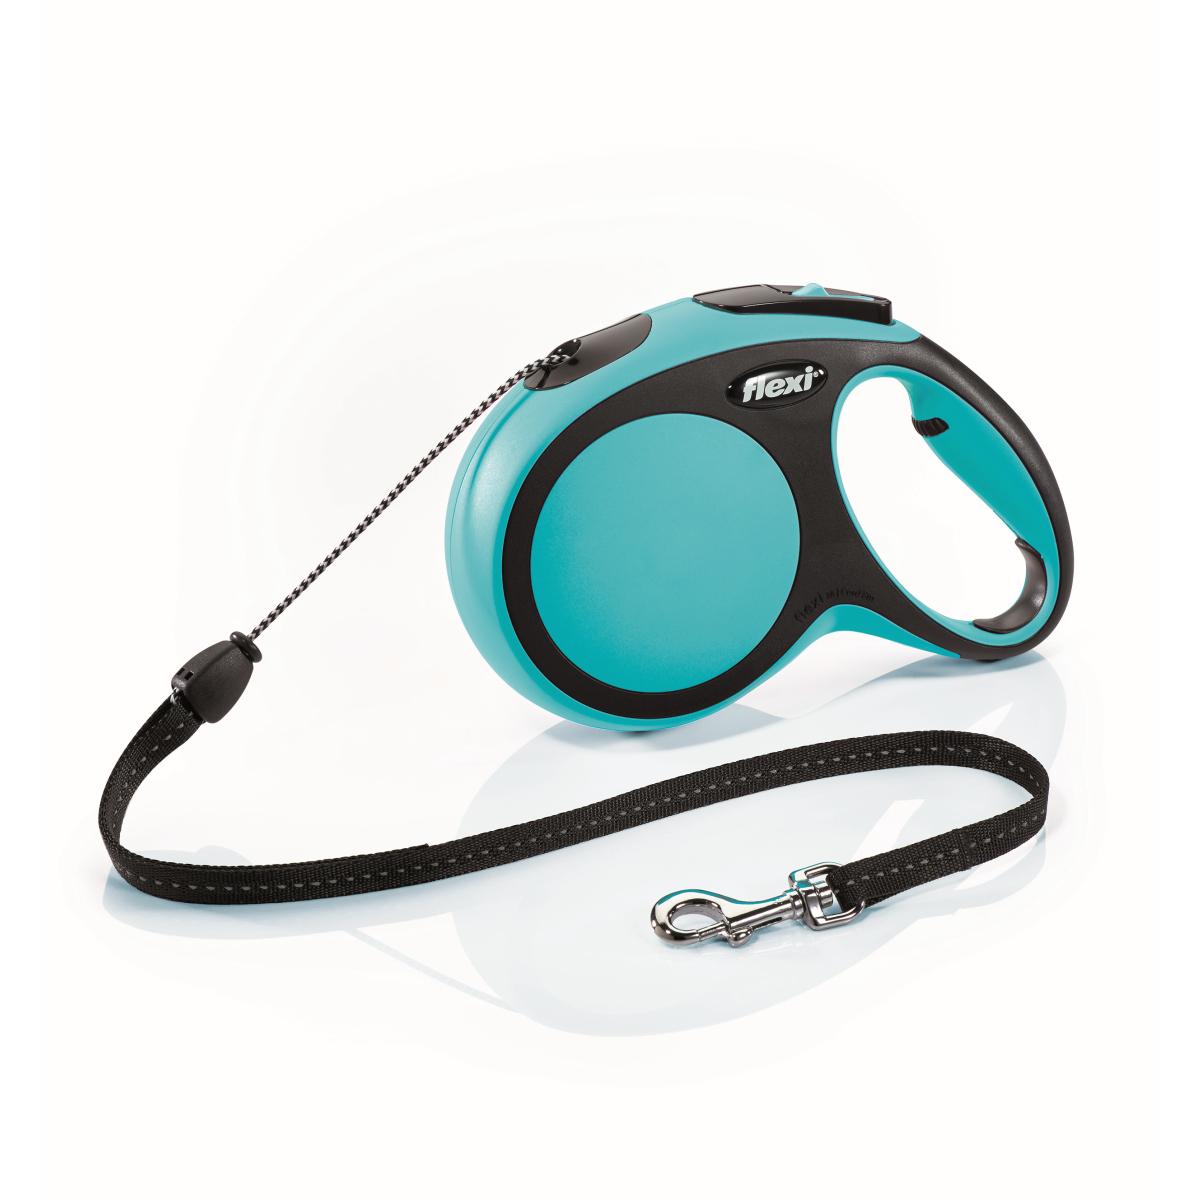 Flexi - new comfort cord m - 8 m blauw